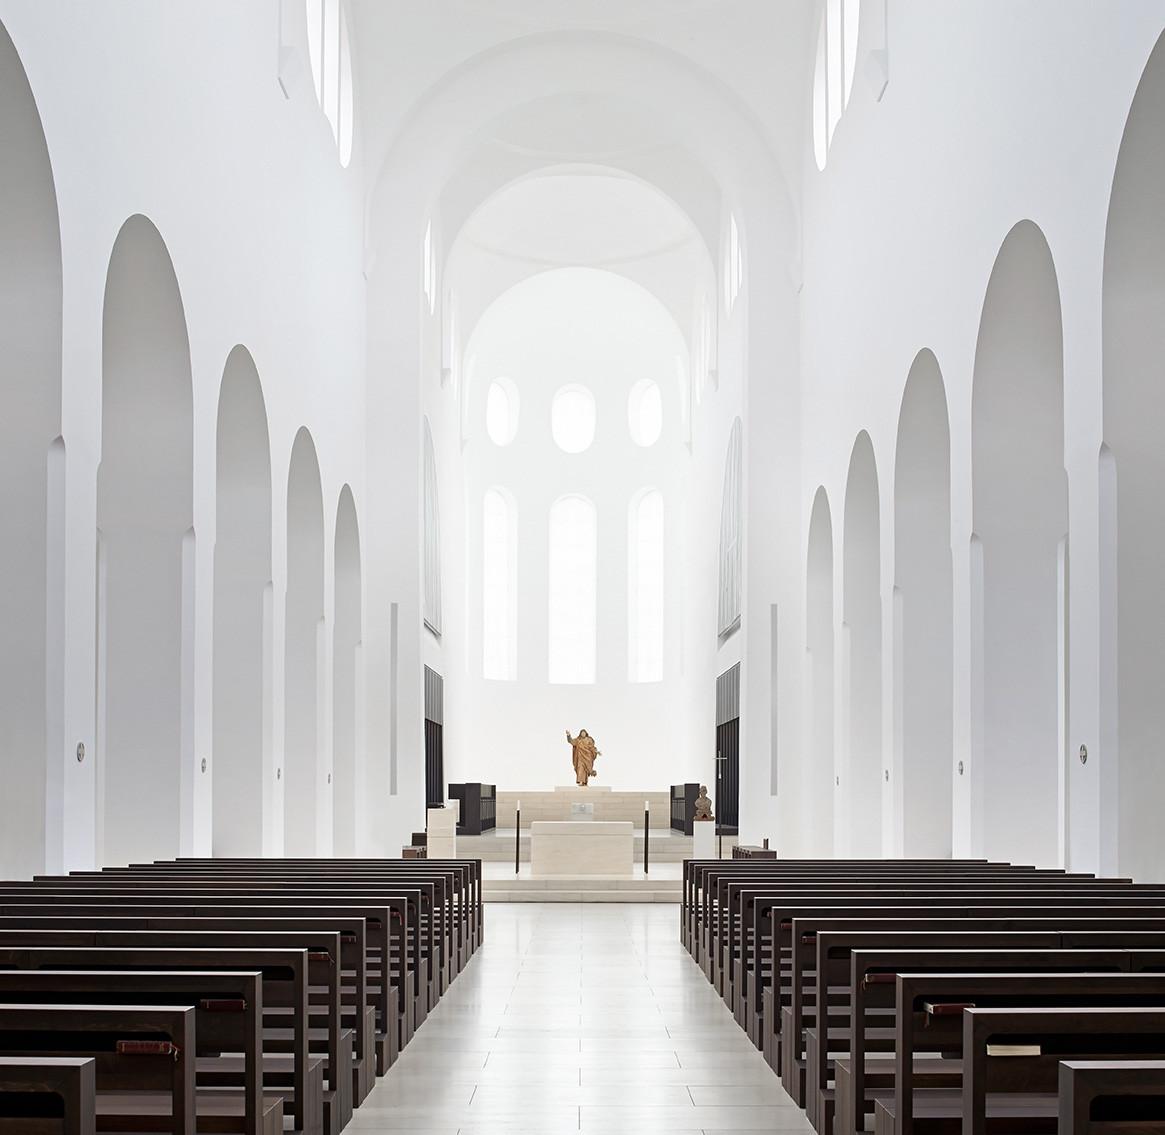 Interior Remodeling of St. Moritz Church / John Pawson, © Hufton+Crow